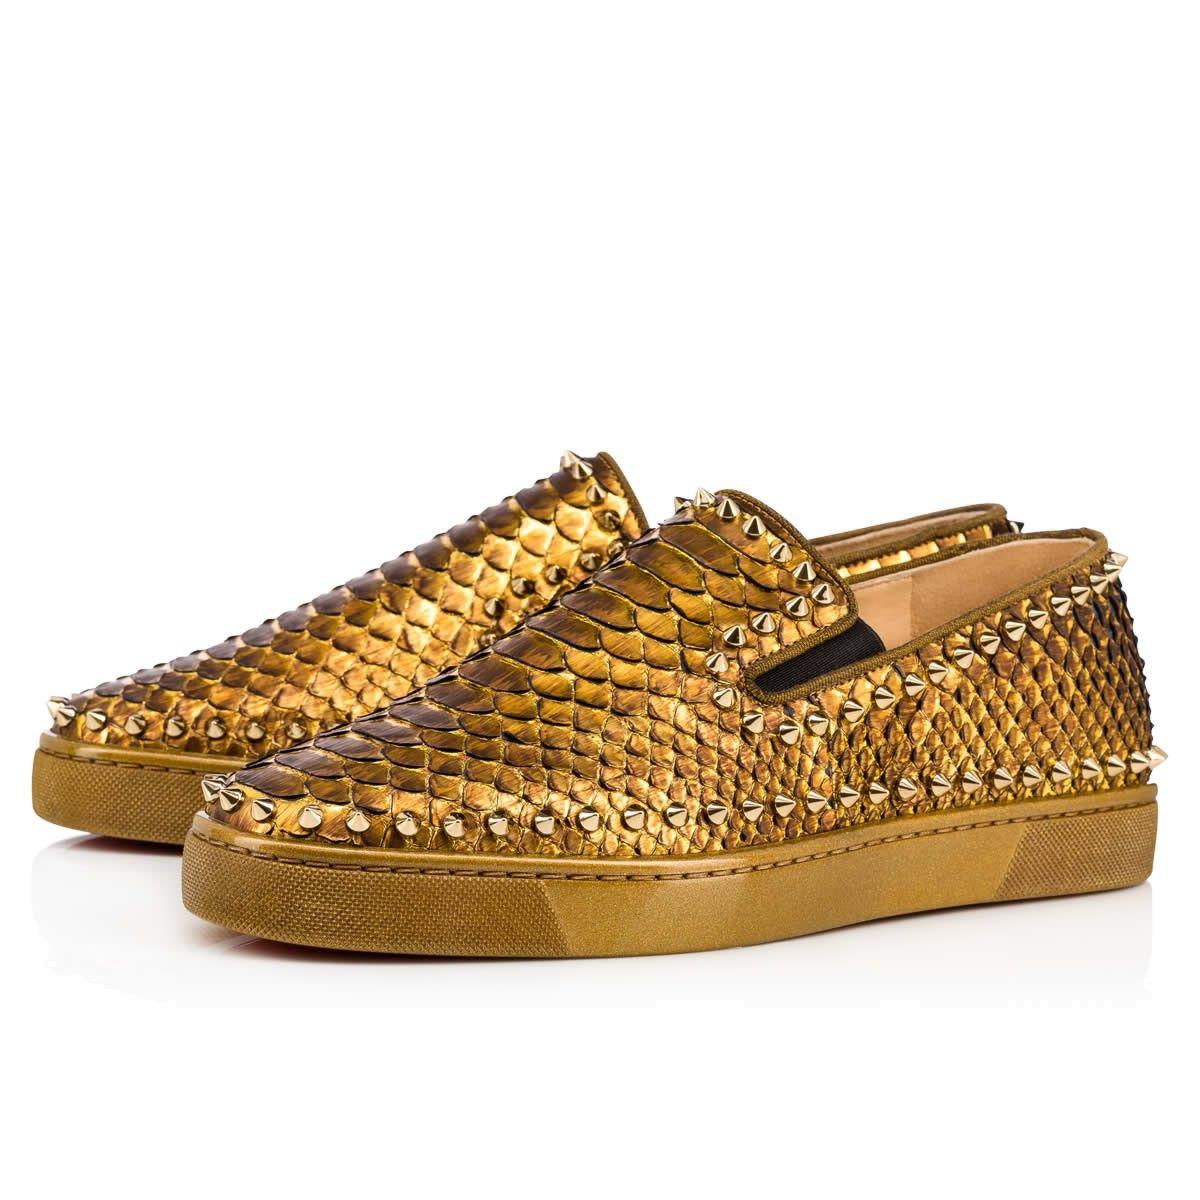 57edf5478948 CHRISTIAN LOUBOUTIN Pik Boat Python Cuirasse Antic Gold Bronze Python - Men  Shoes - Christian Louboutin.  christianlouboutin  shoes